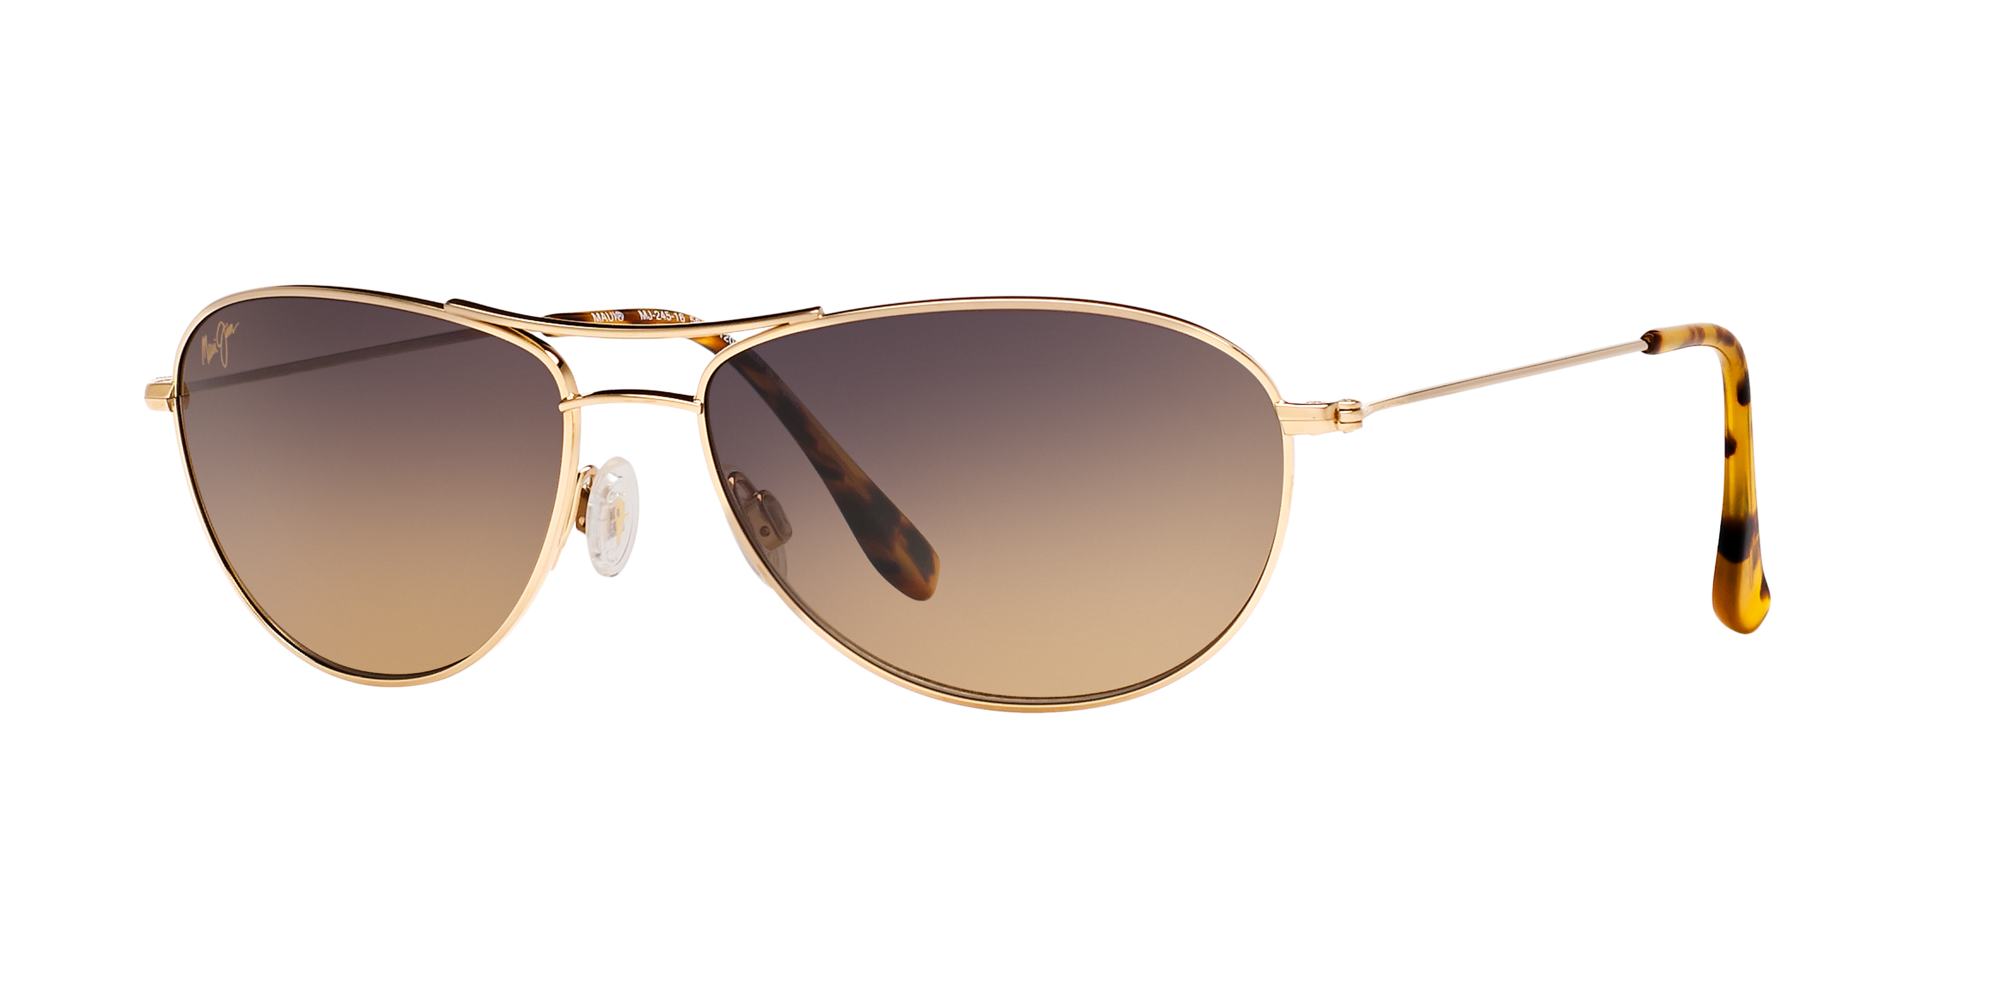 Maui Jim Baby Beach MJ245 16 Mens Womens Sunglasses Gold Frames Only 56-18-120